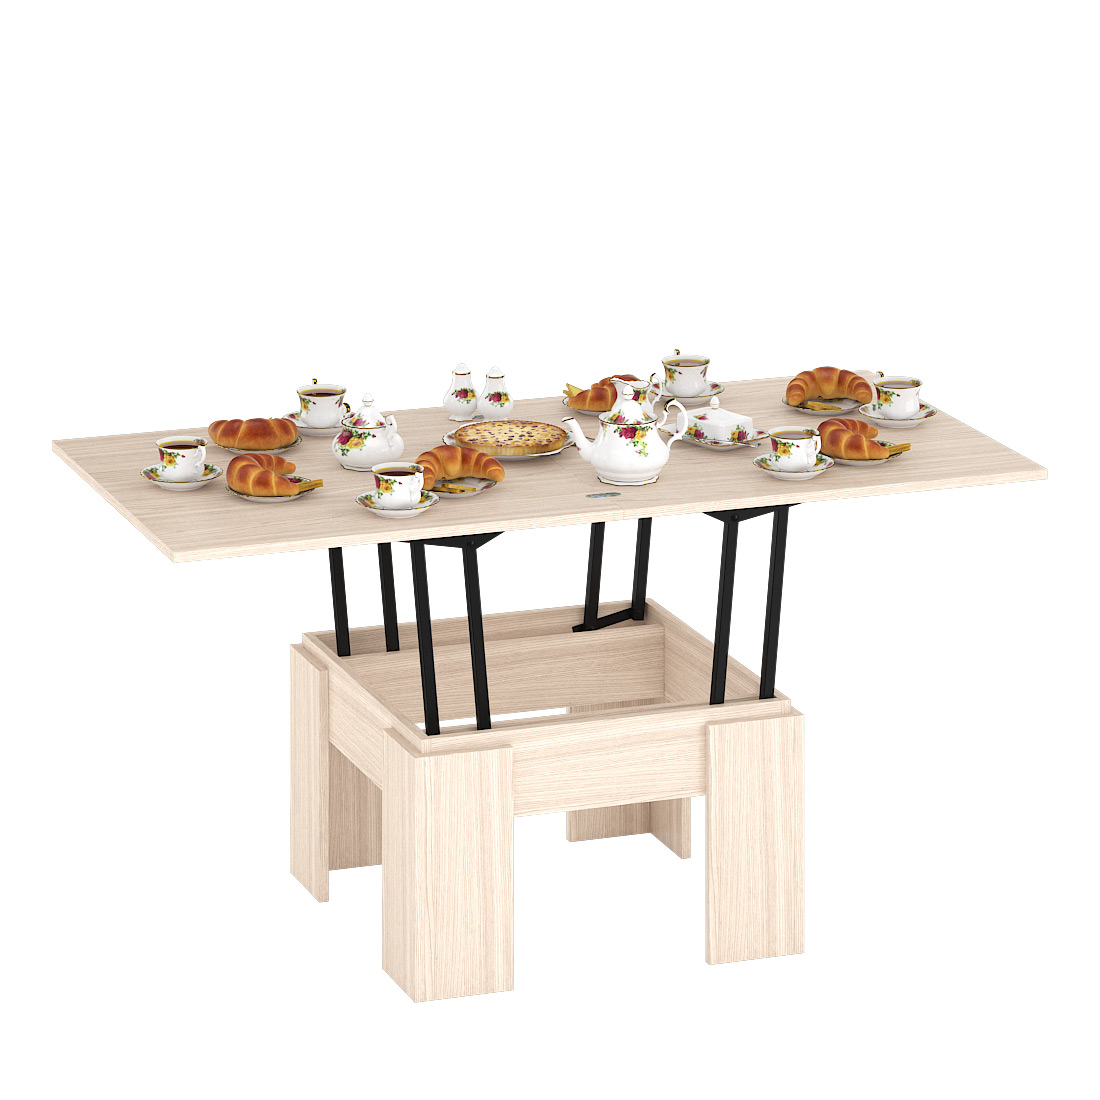 Журнальный столик Delice Бета 1668002 80(160)х80х47,5(81,5)